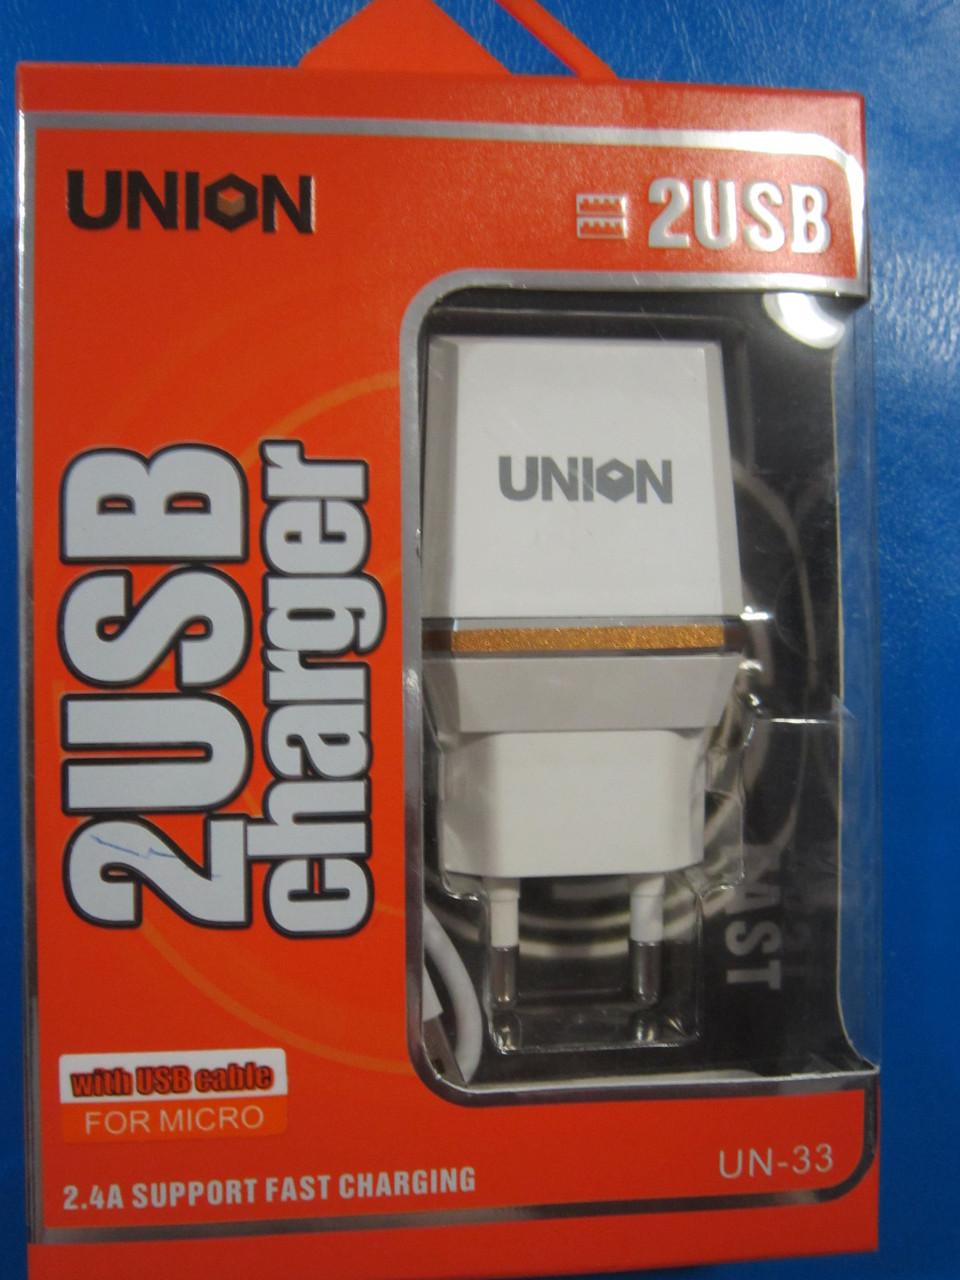 Адаптер Евровилка 220V на USB 5V+кабель micro USB (UN 33) (UN23)